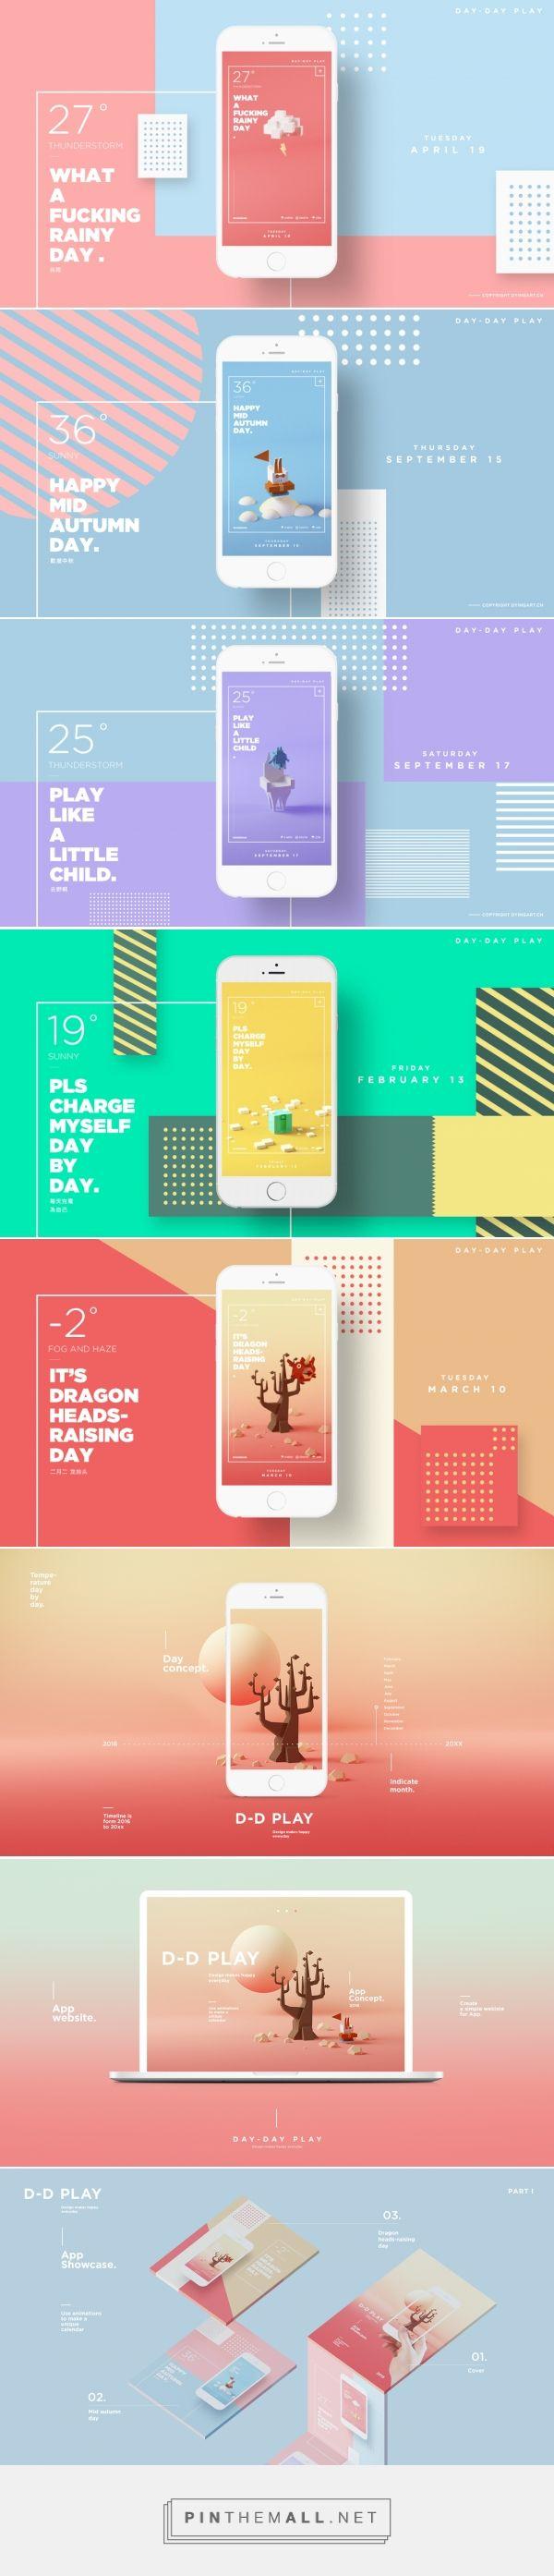 D-D Play – App Design | Abduzeedo Design Inspiration